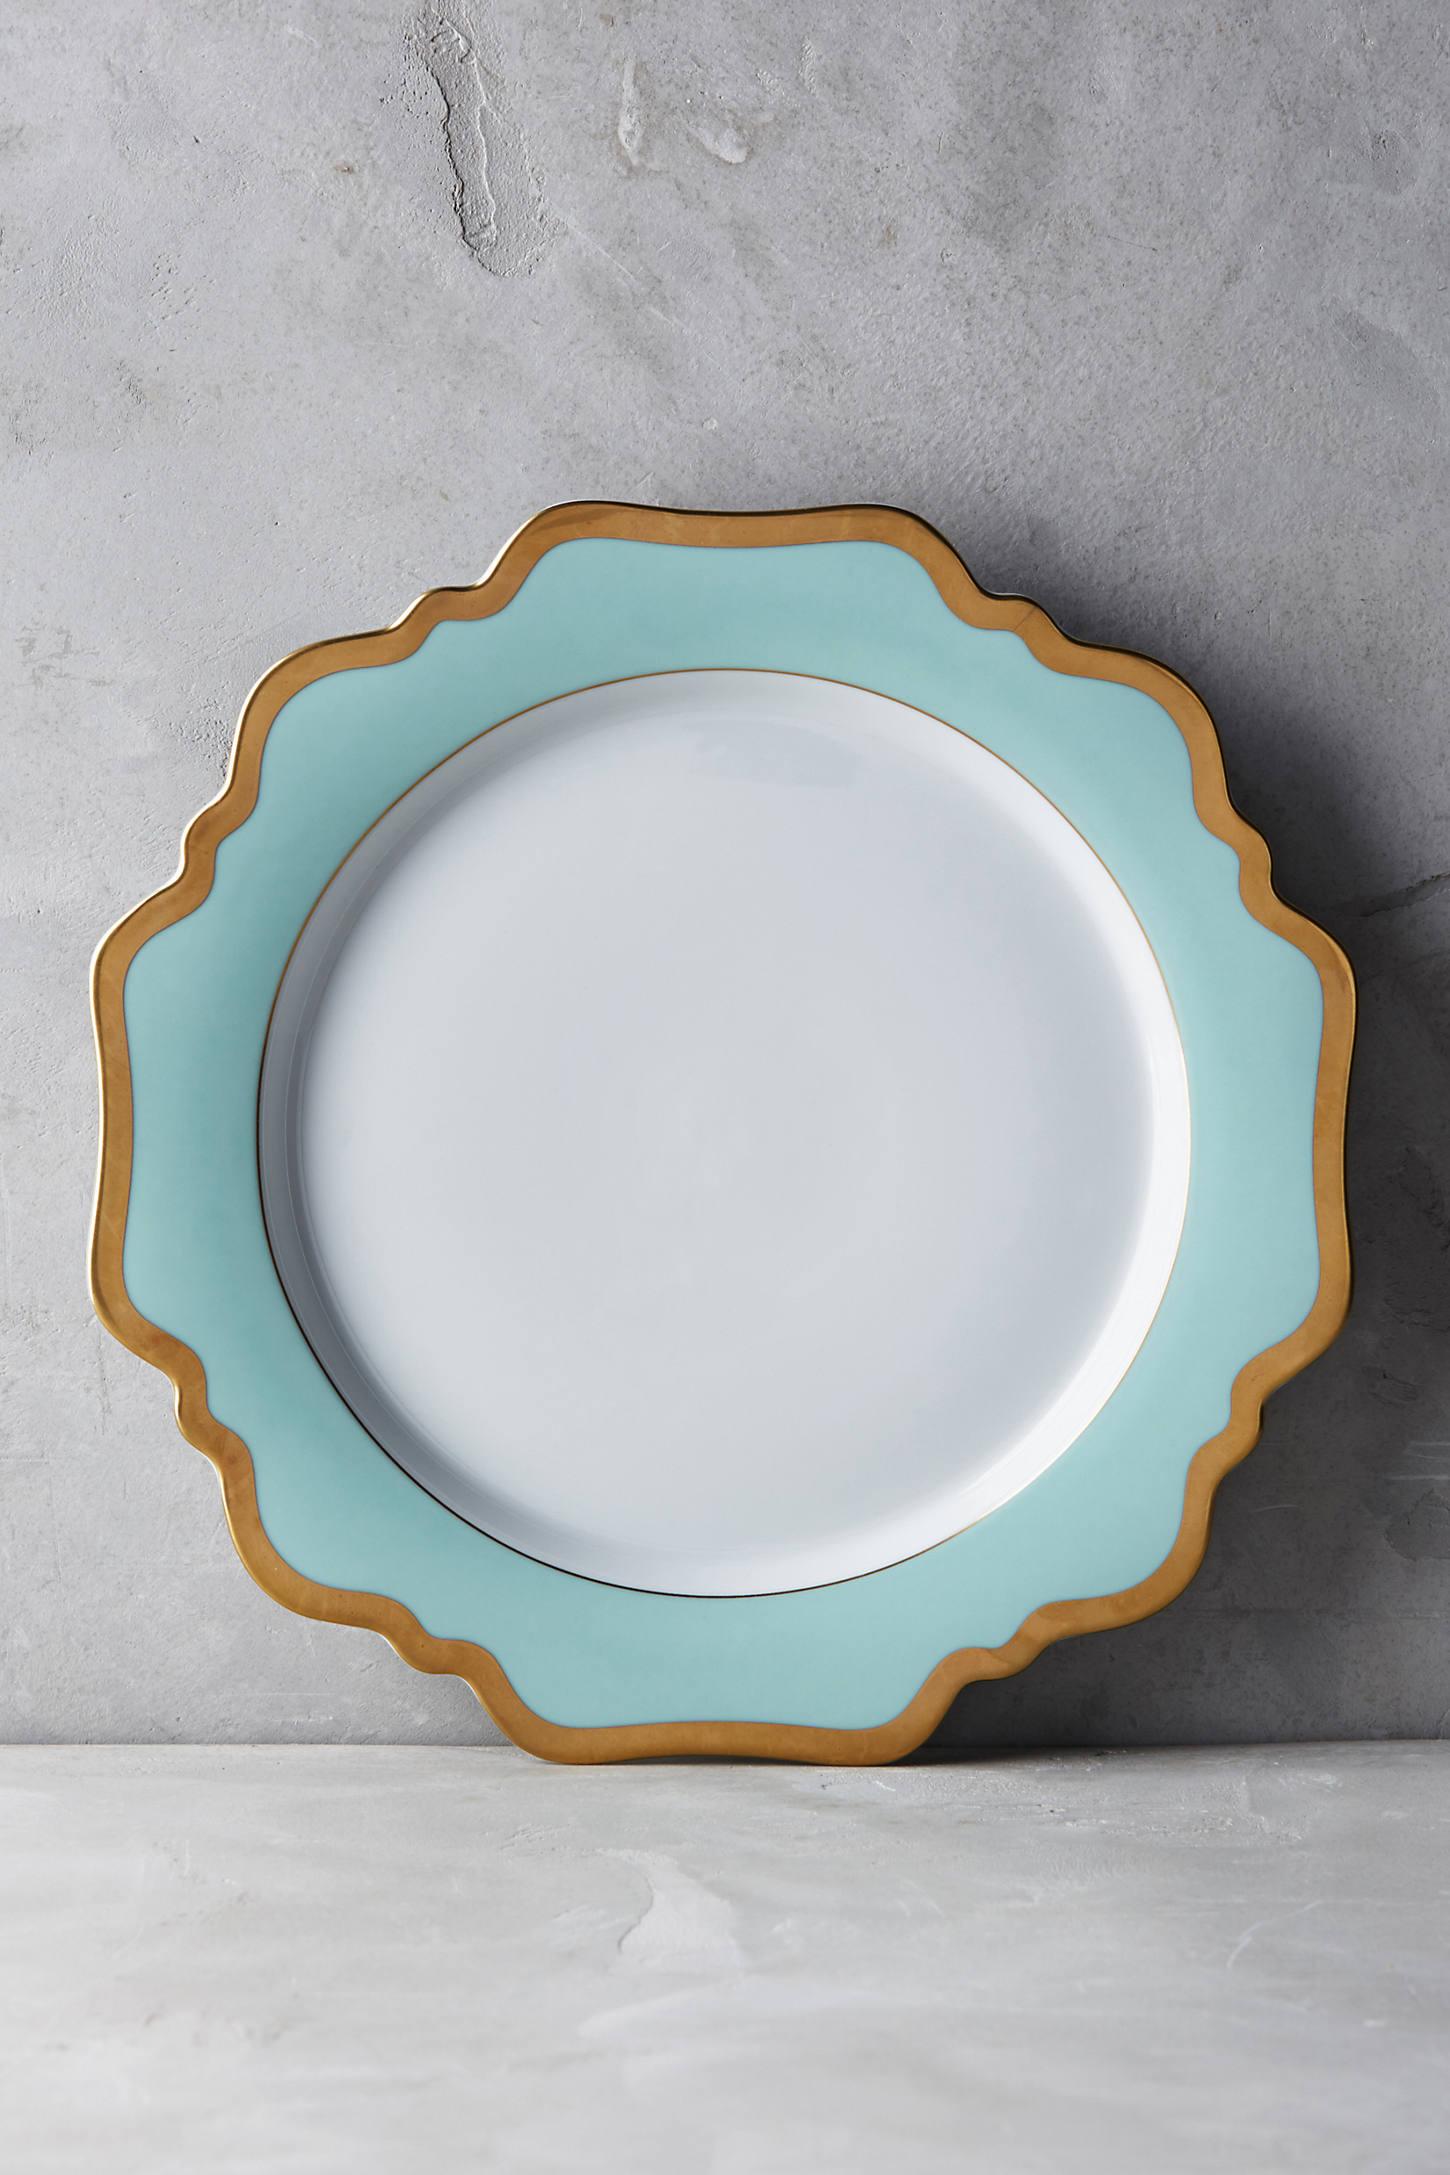 Anna's Palette Aqua Green Dinner Plate